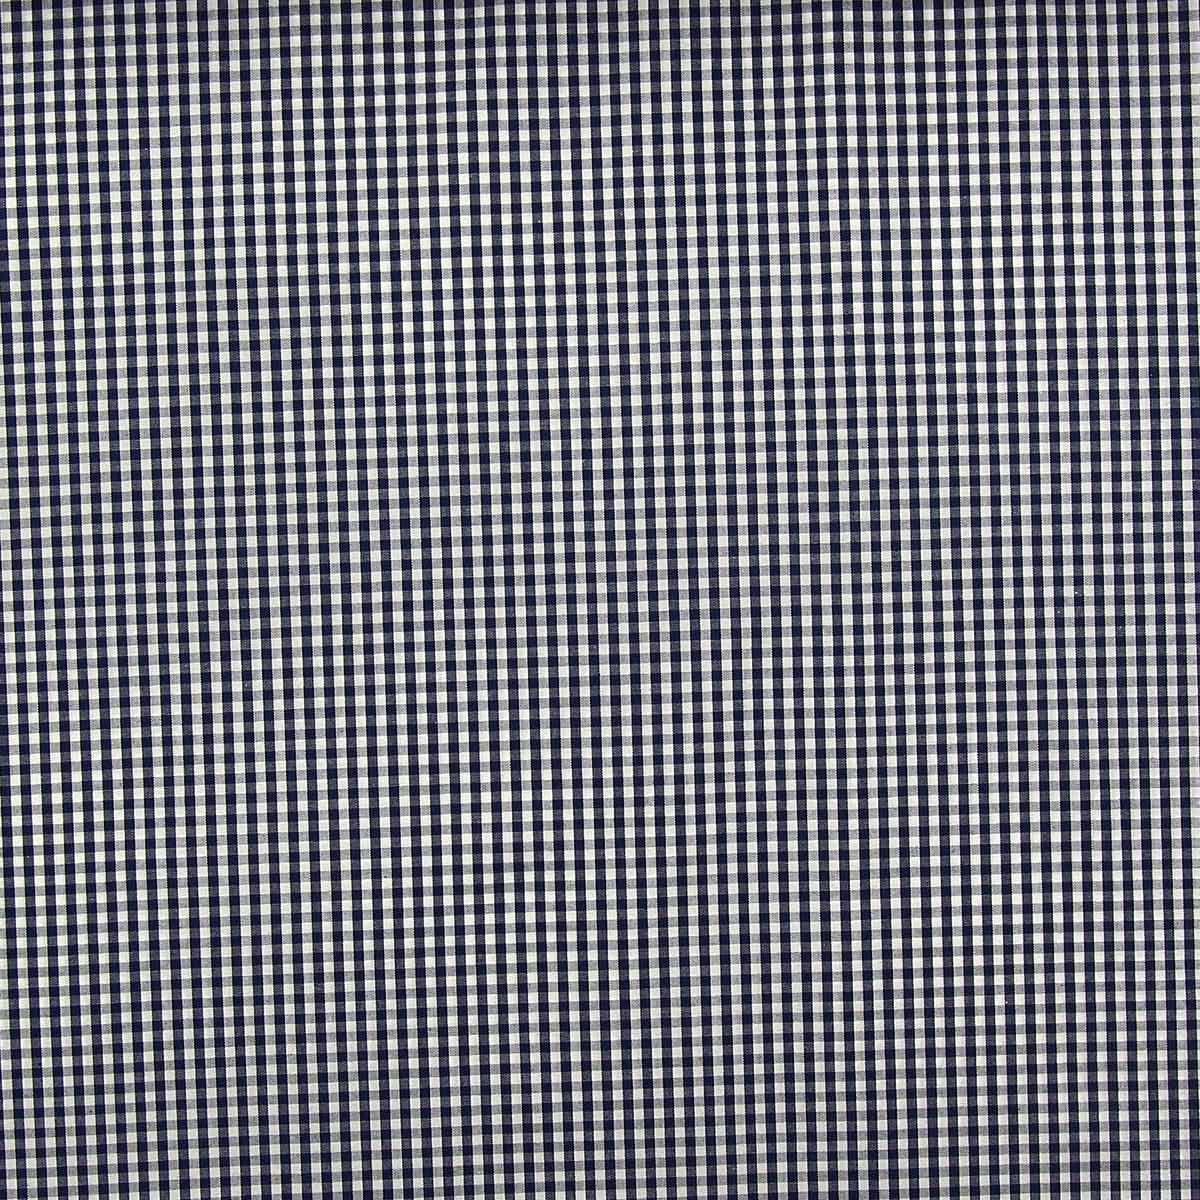 Tissu popeline de coton - Vichy petits carreaux - Bleu marine